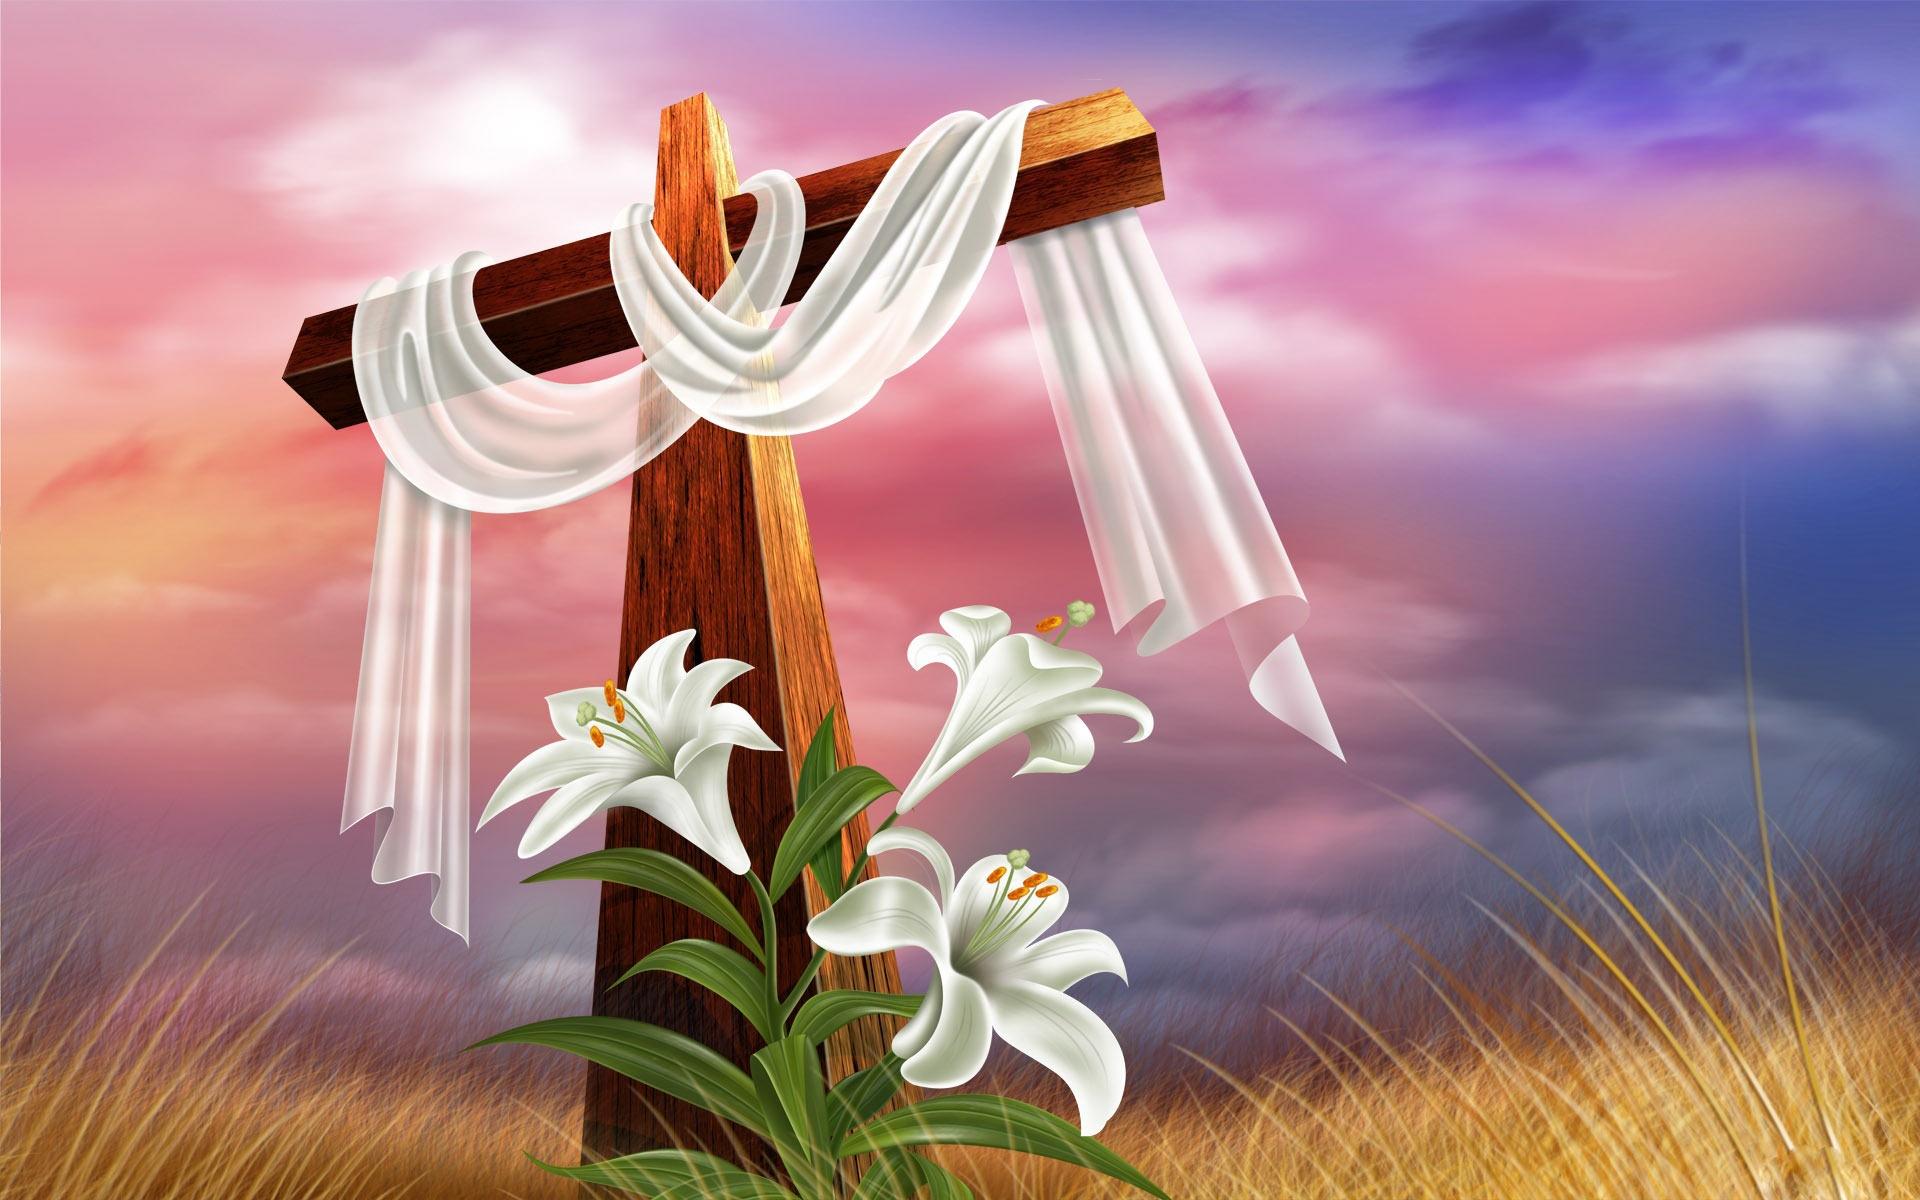 Jesus Wallpapers Images HD cross peace